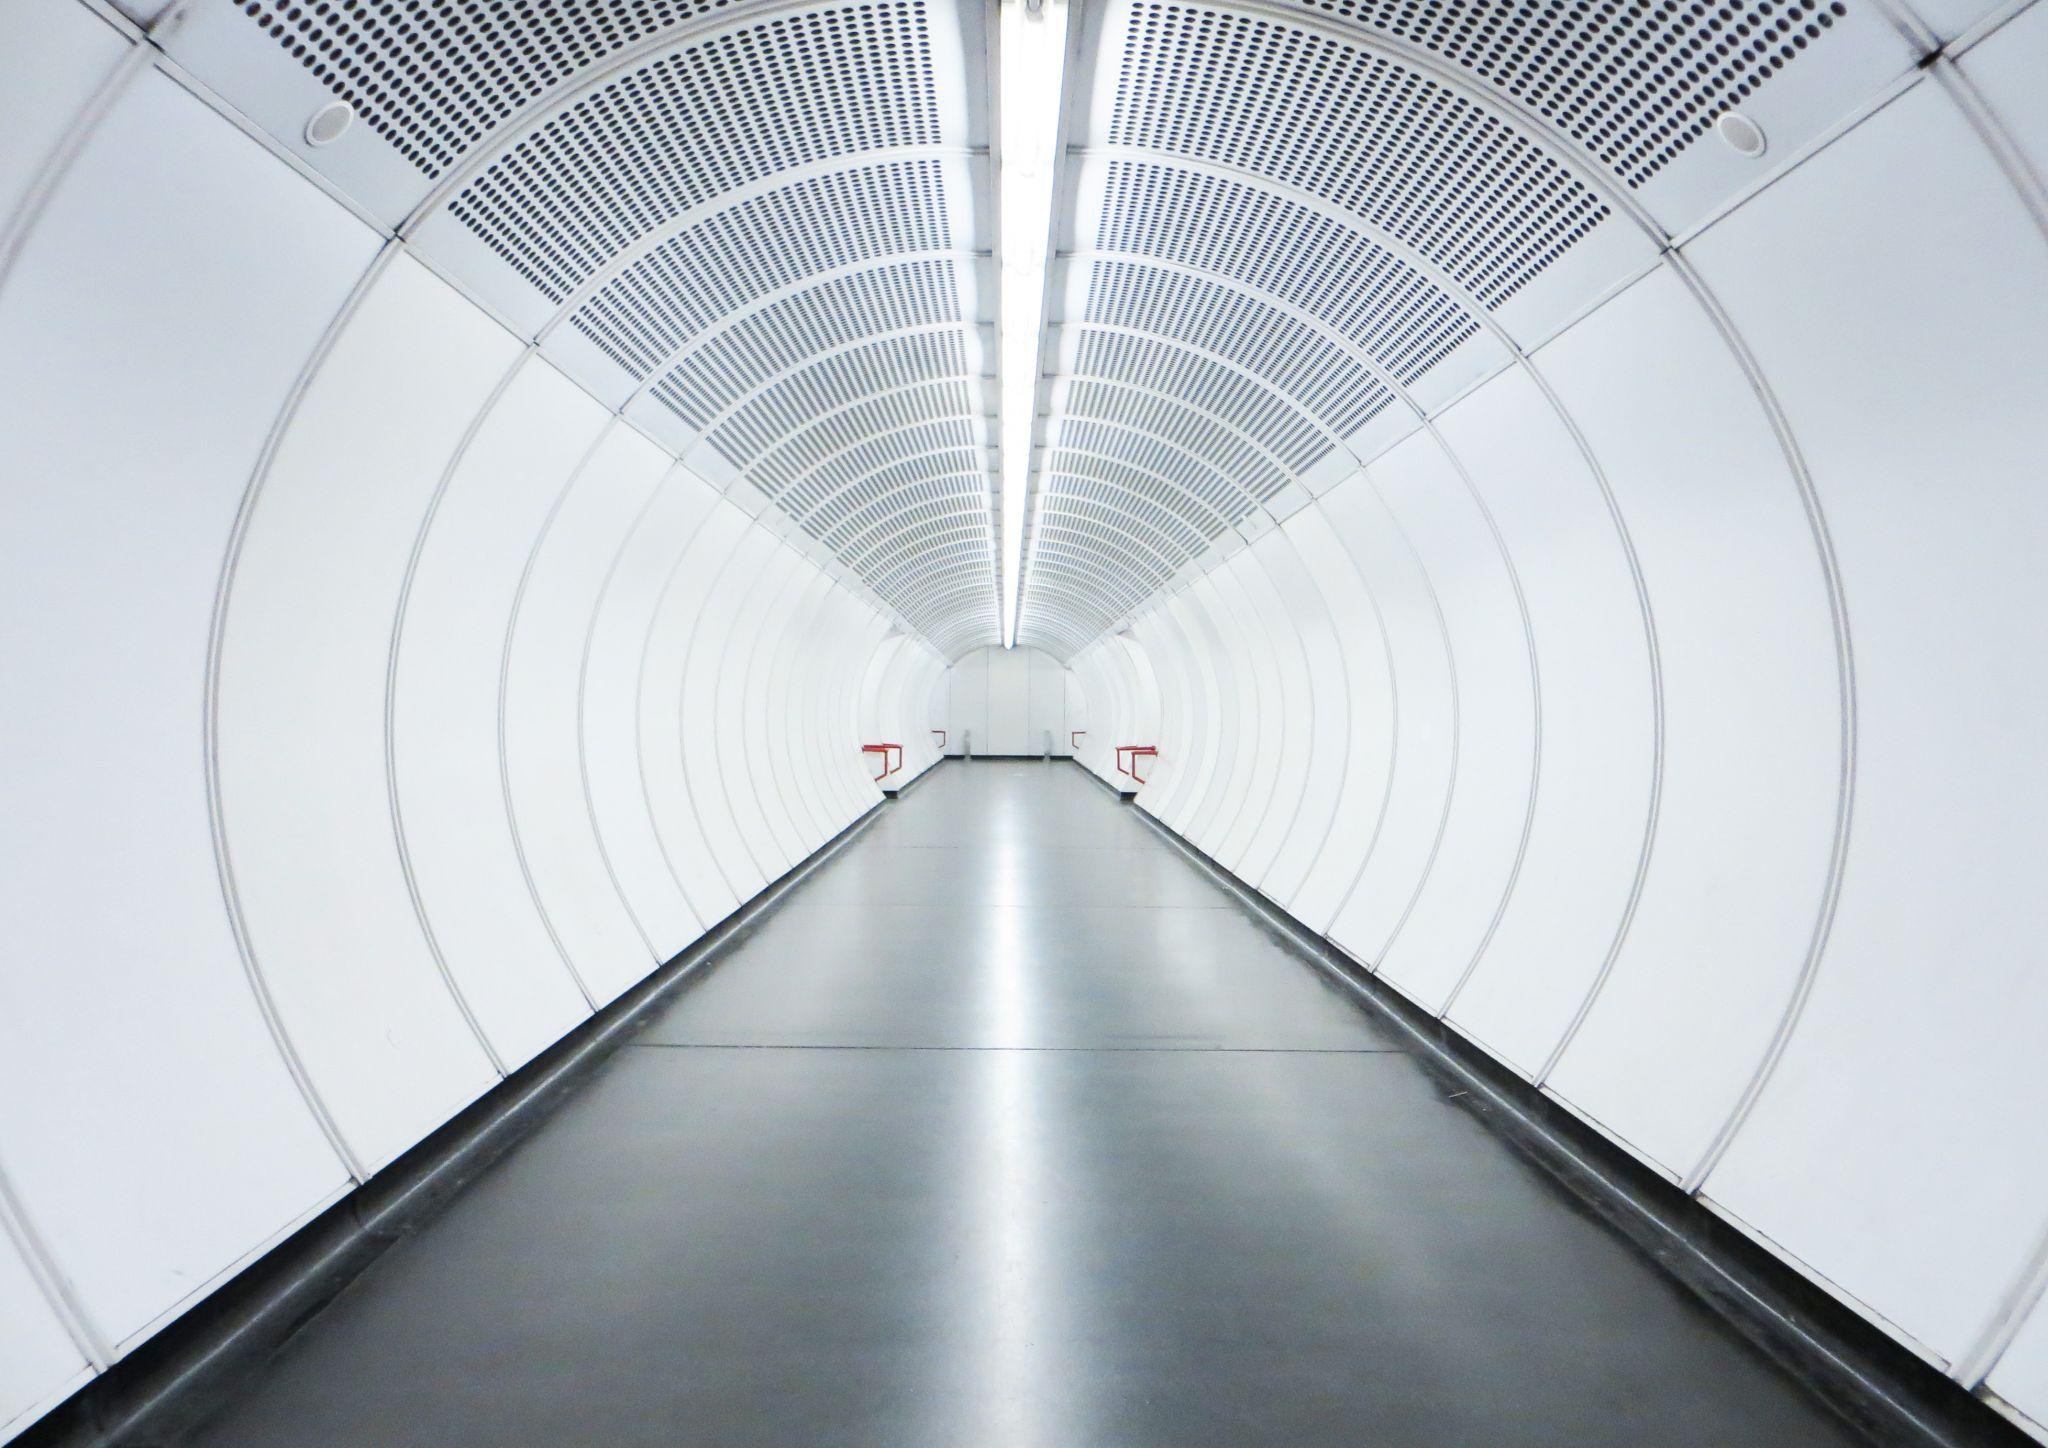 Südtiroler Platz - Subway Station, Austria